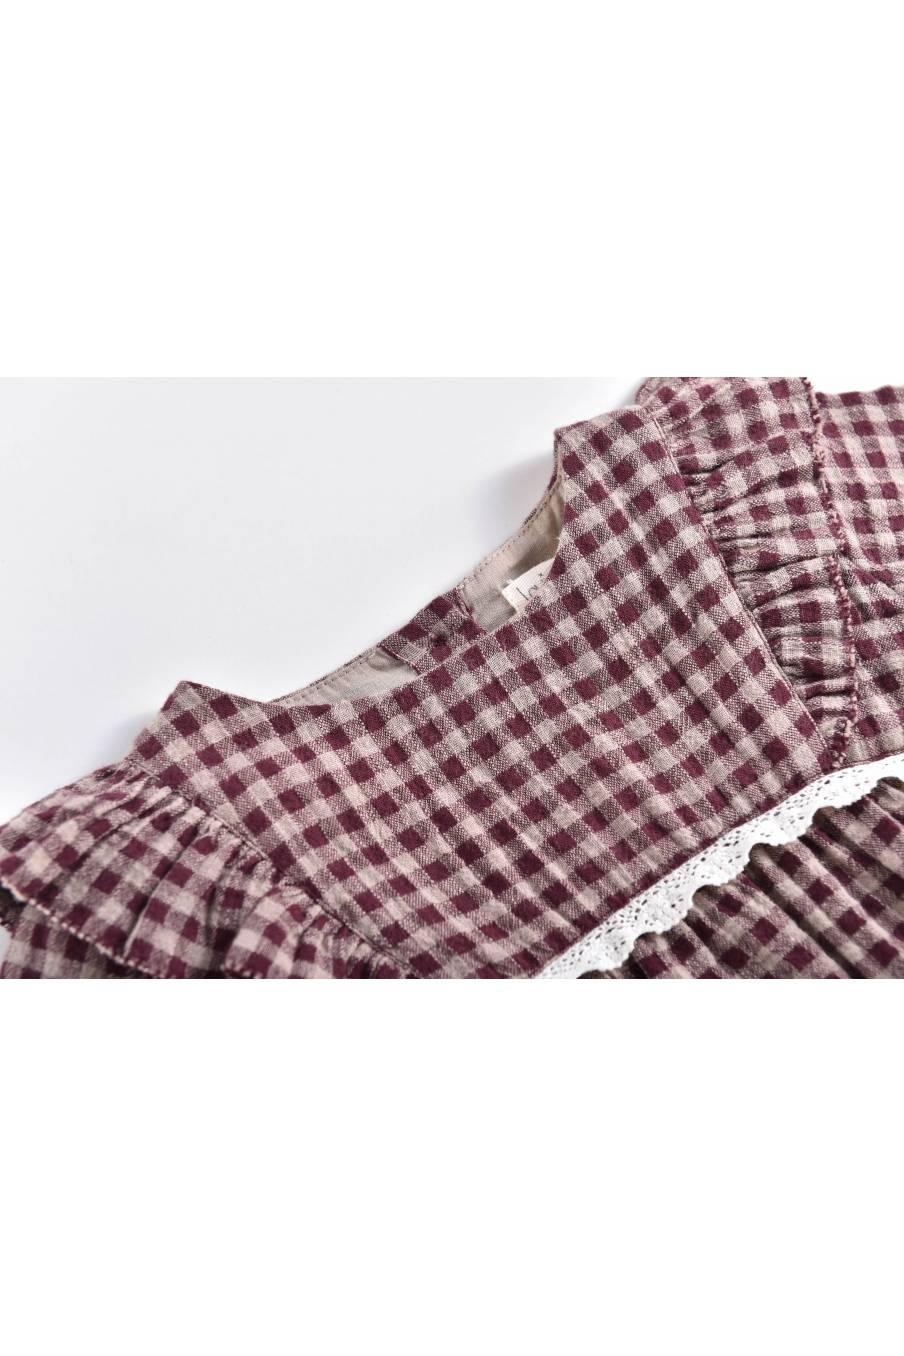 boheme chic vintage robe bébé fille alaka aubergine vichy